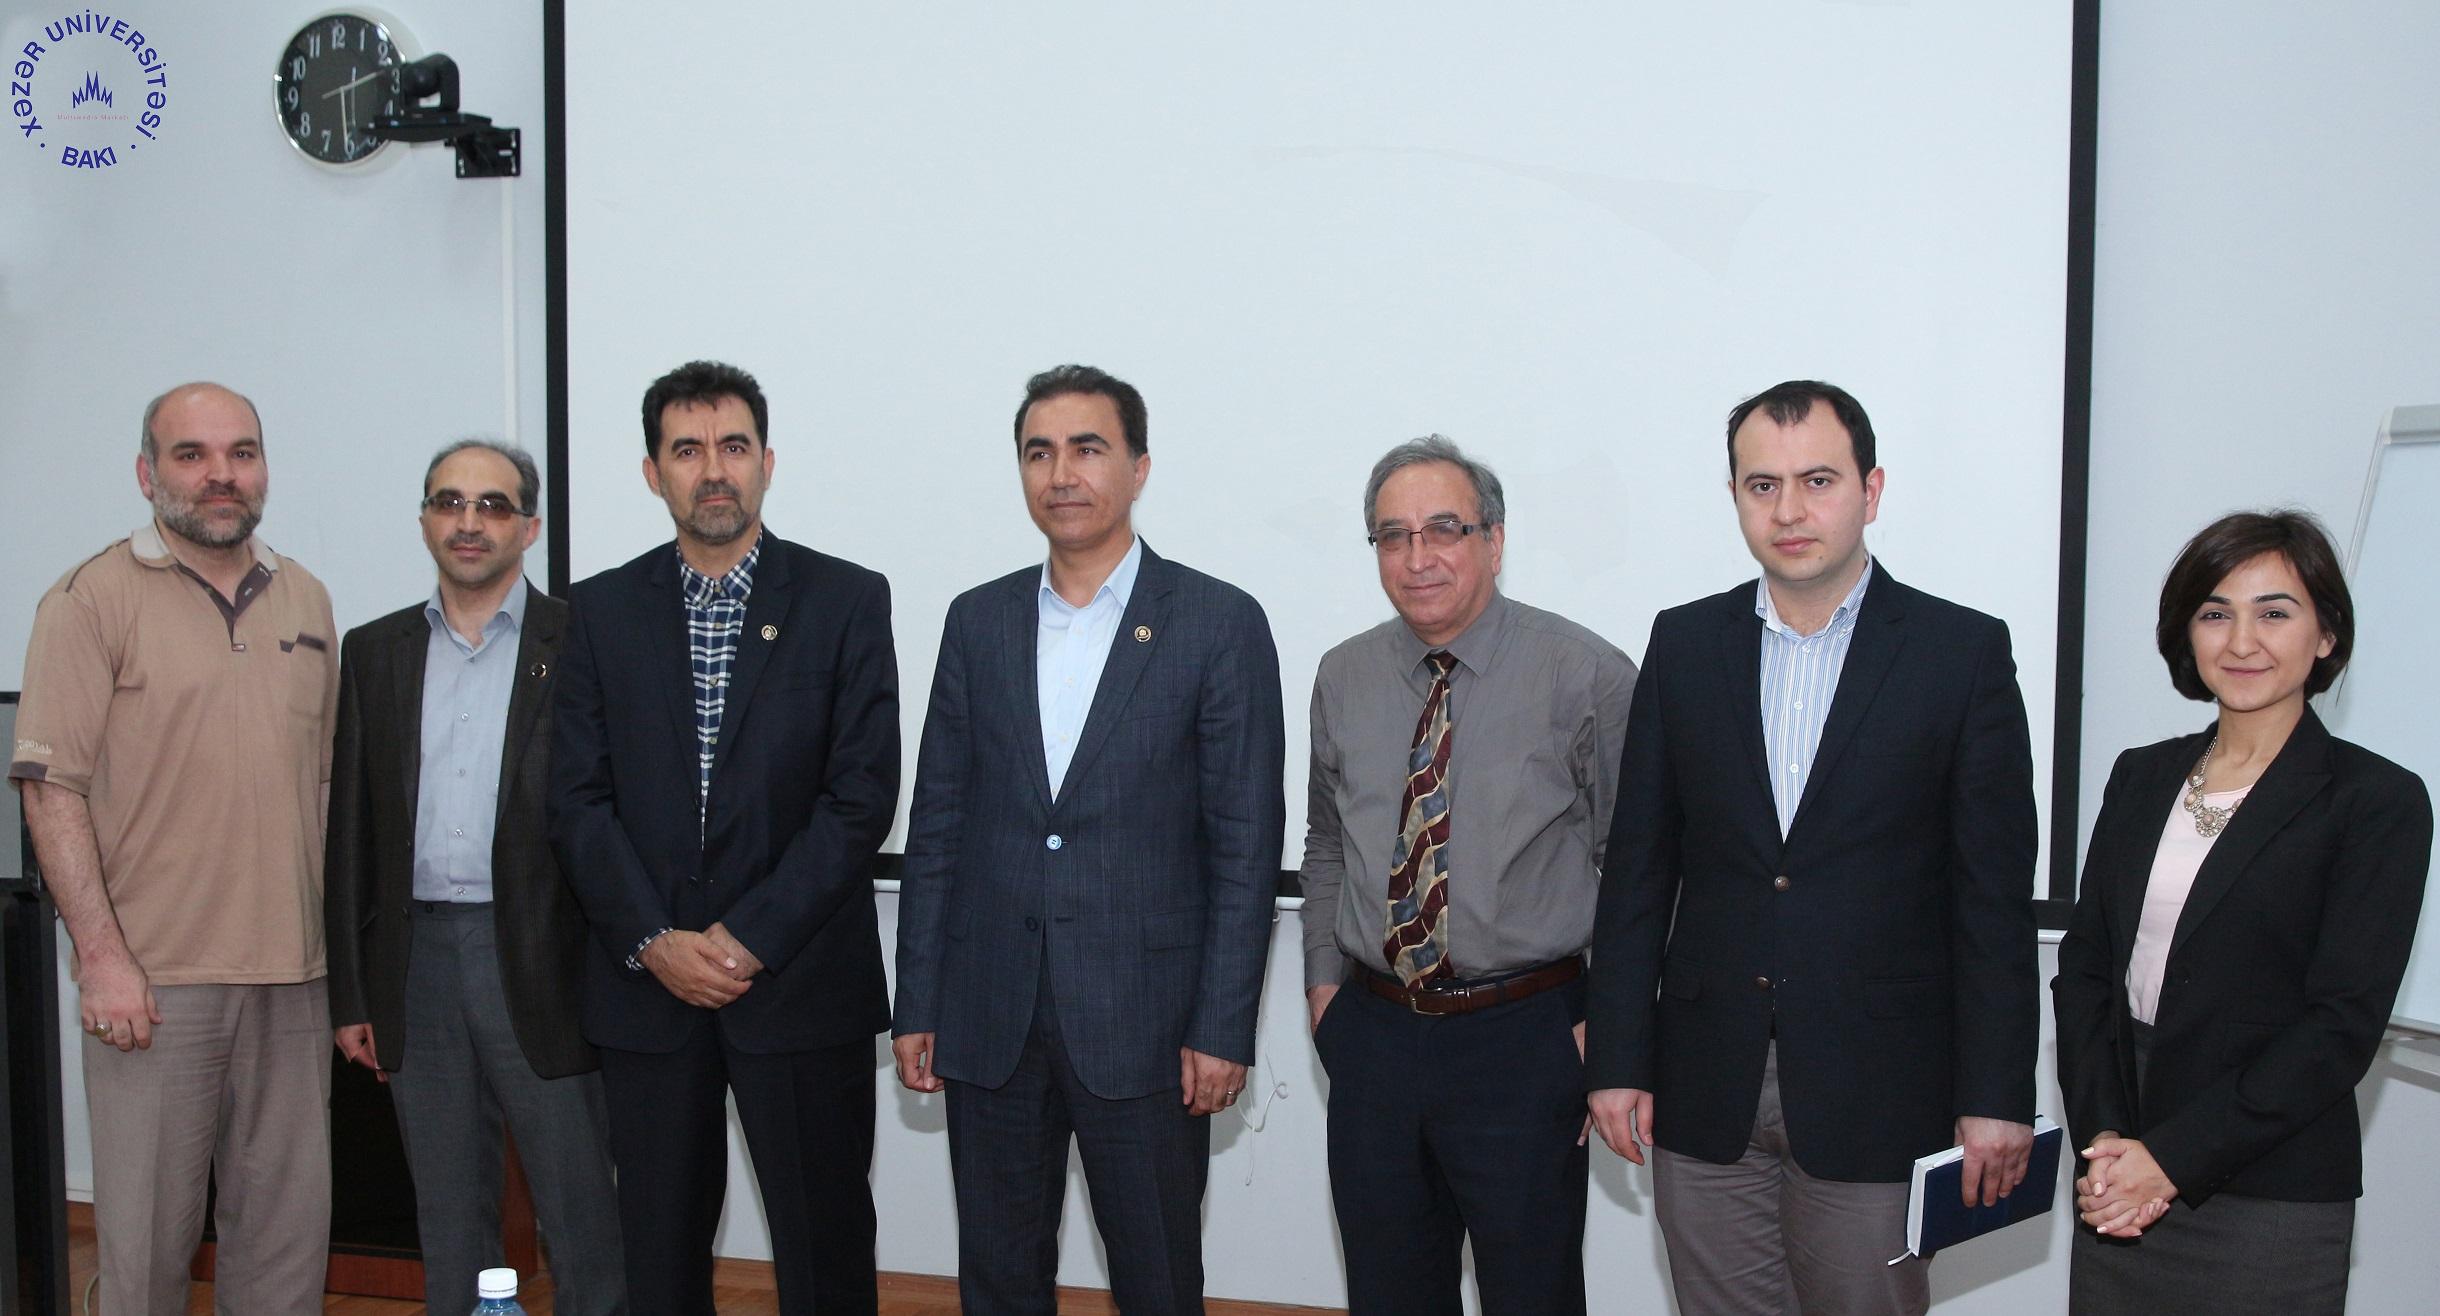 Delegation from Azarbaijan Shahid Madani University Visits Khazar University